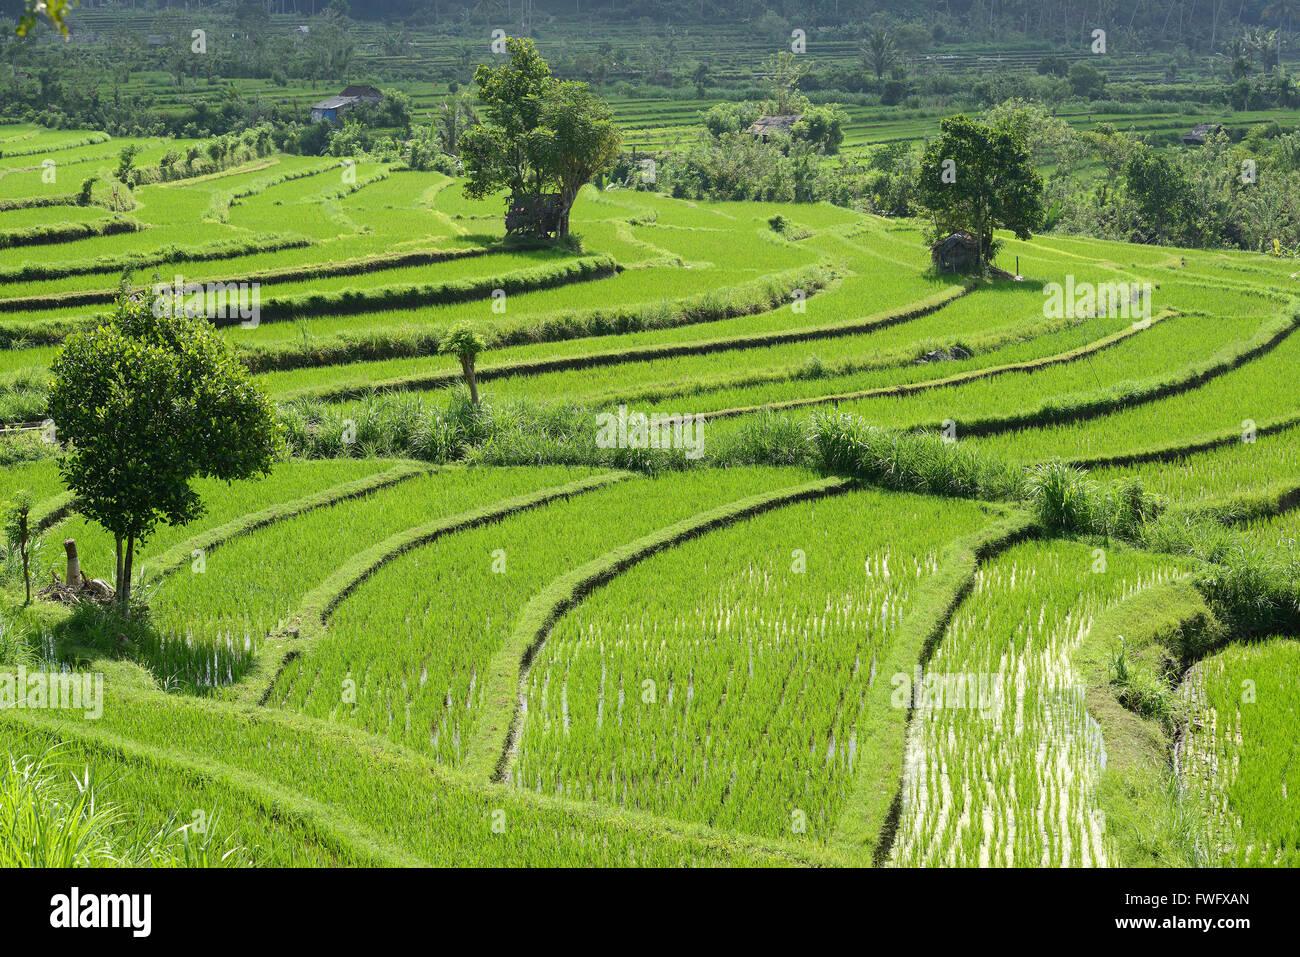 Rice terraces, Bali, Indonesia - Stock Image